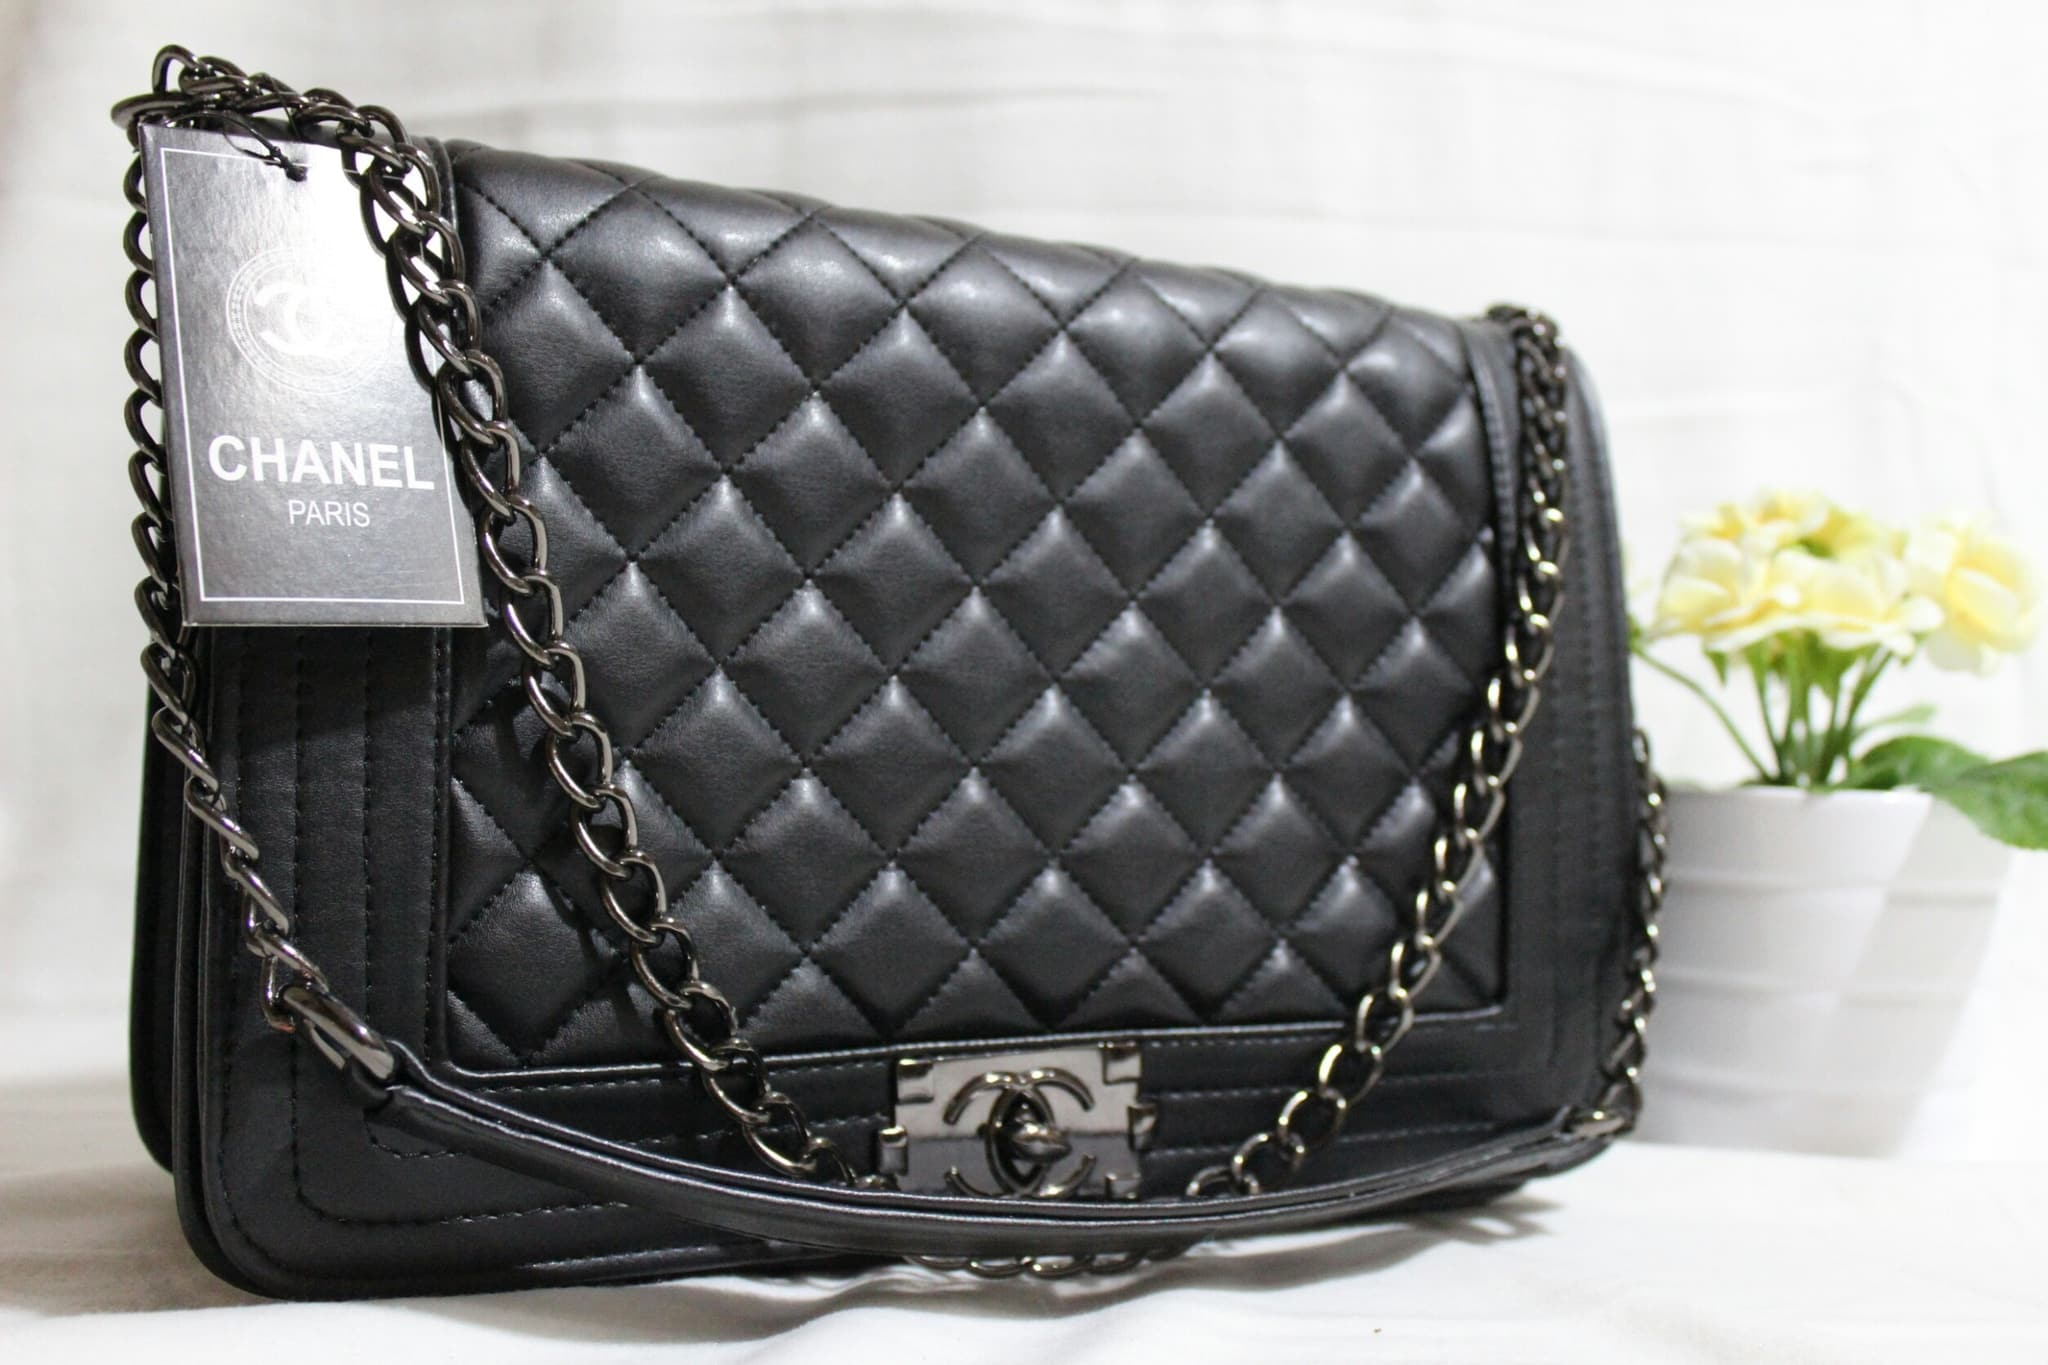 Jual Tas Tali Rantai Branded Chanel Boy Maxi Ukuran Besar 30 CM ... dd6fc21ea3